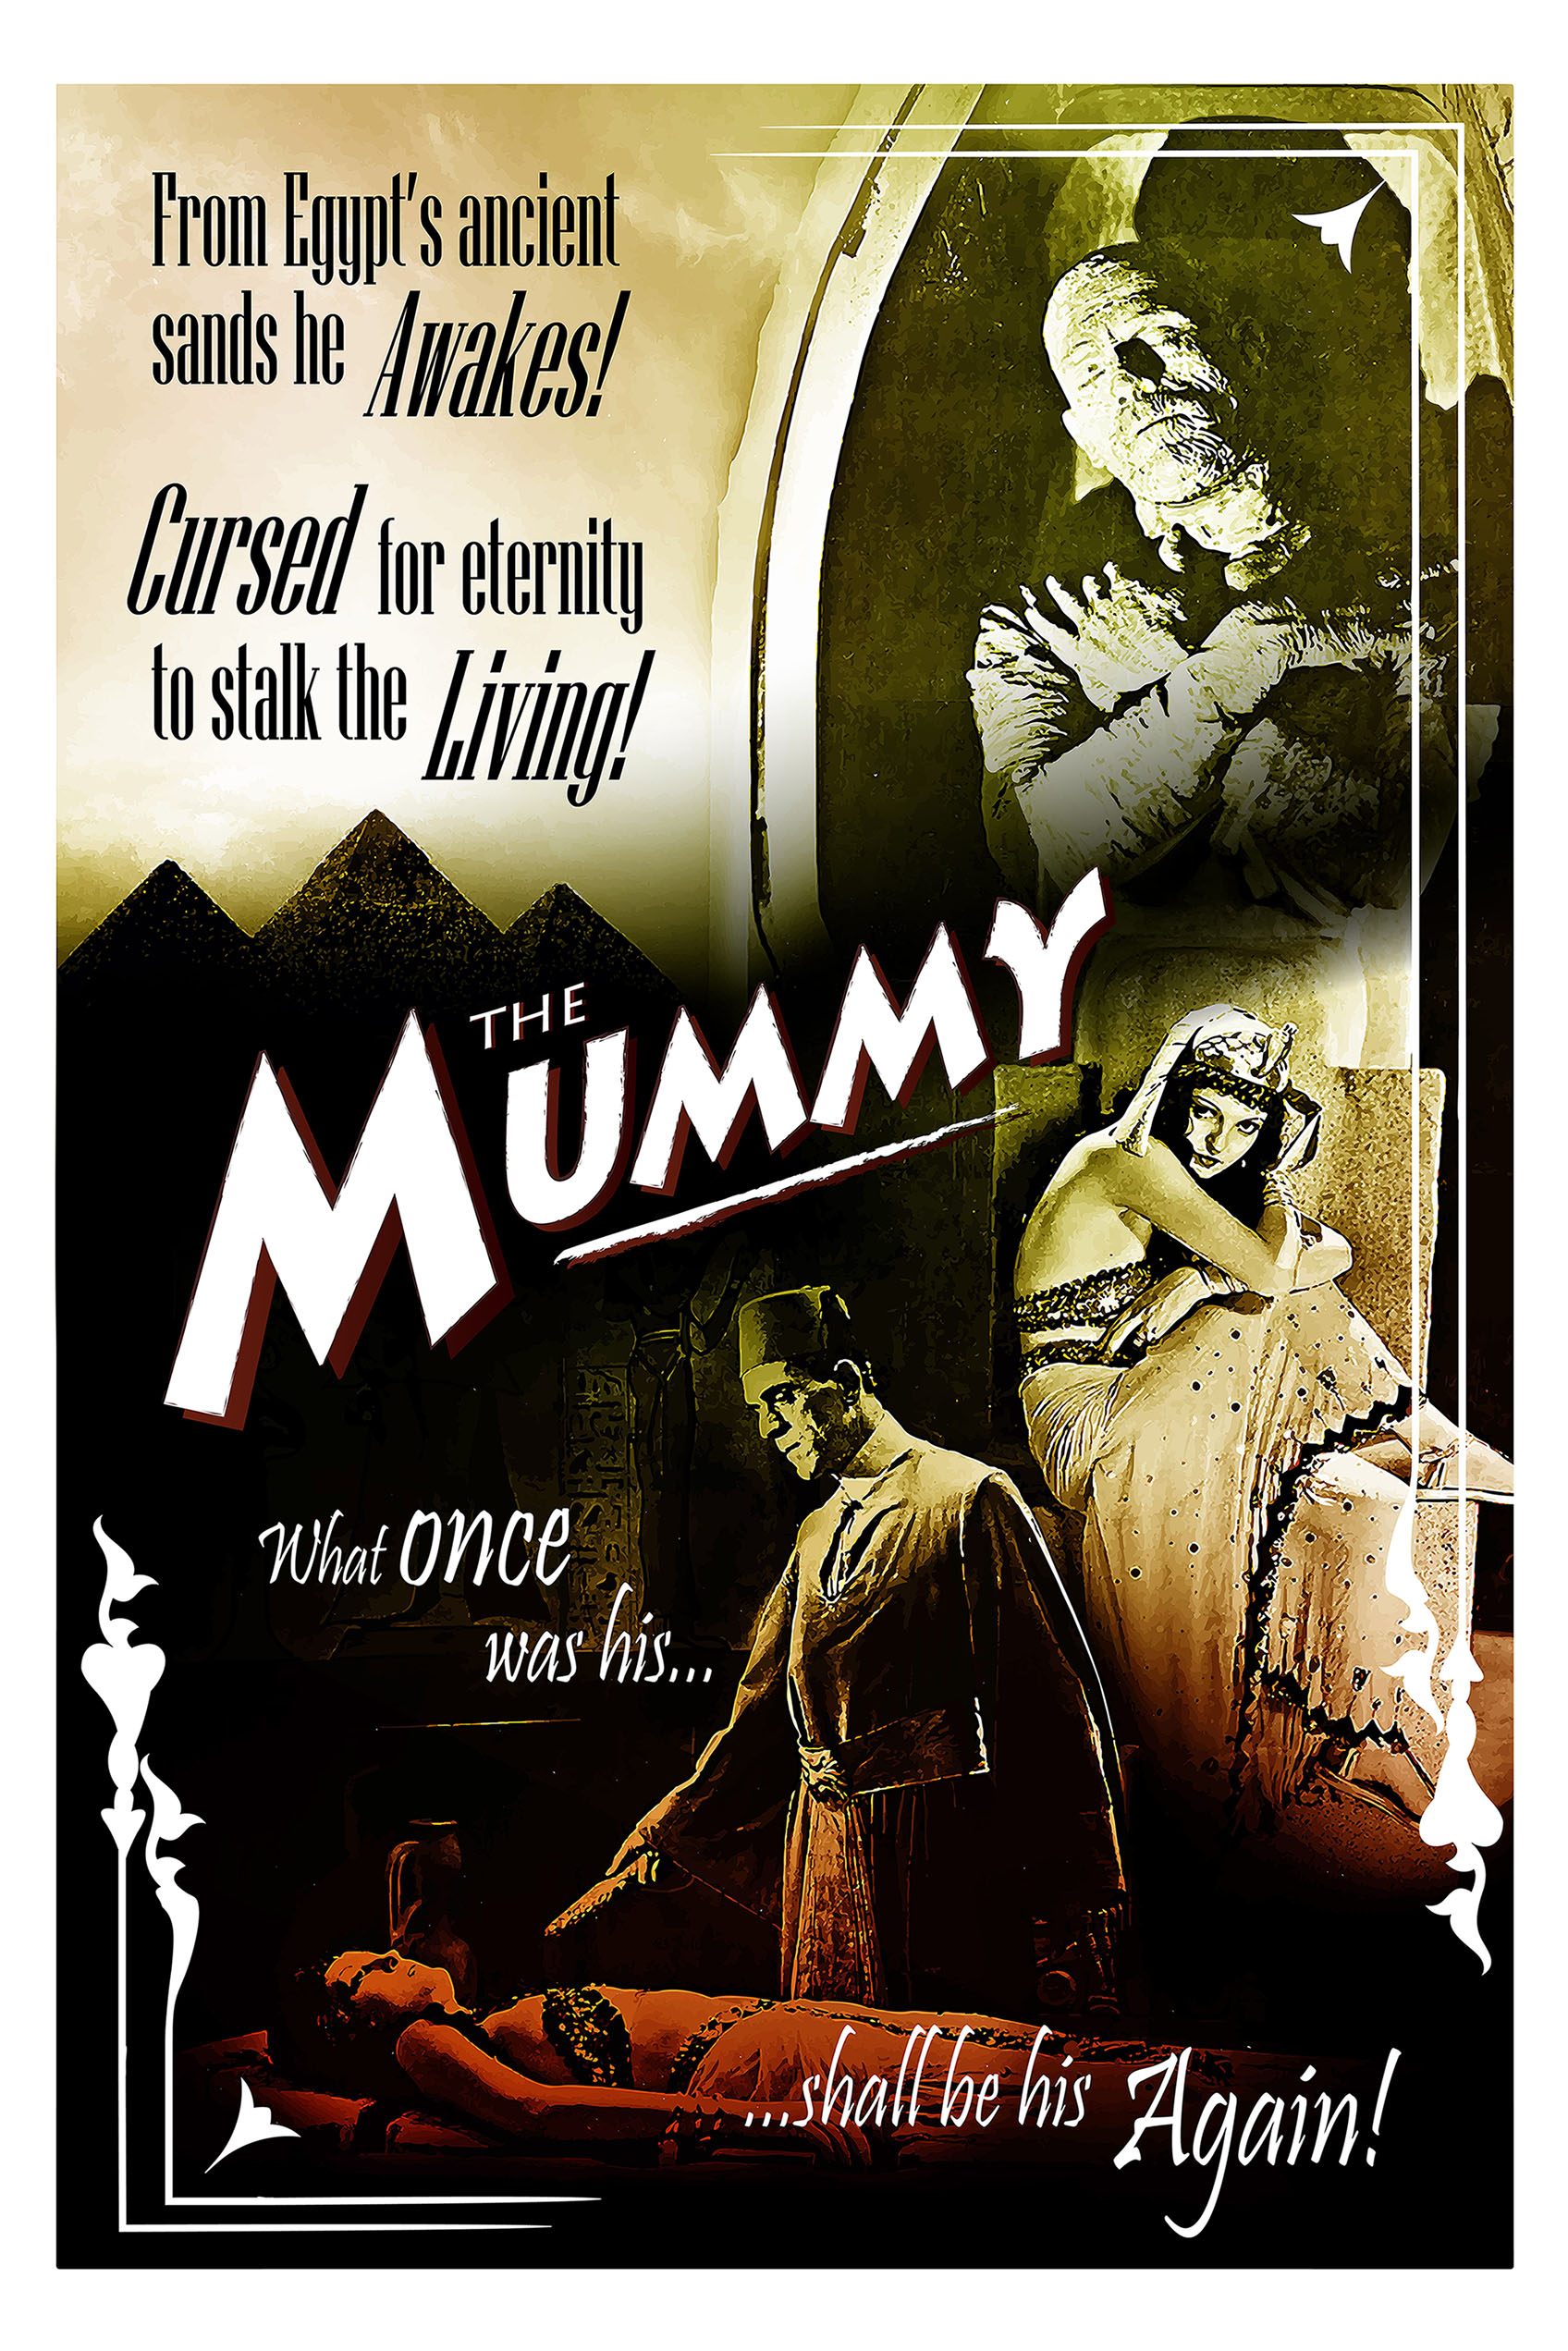 classic horror movie vintage inspired posters jmklatte